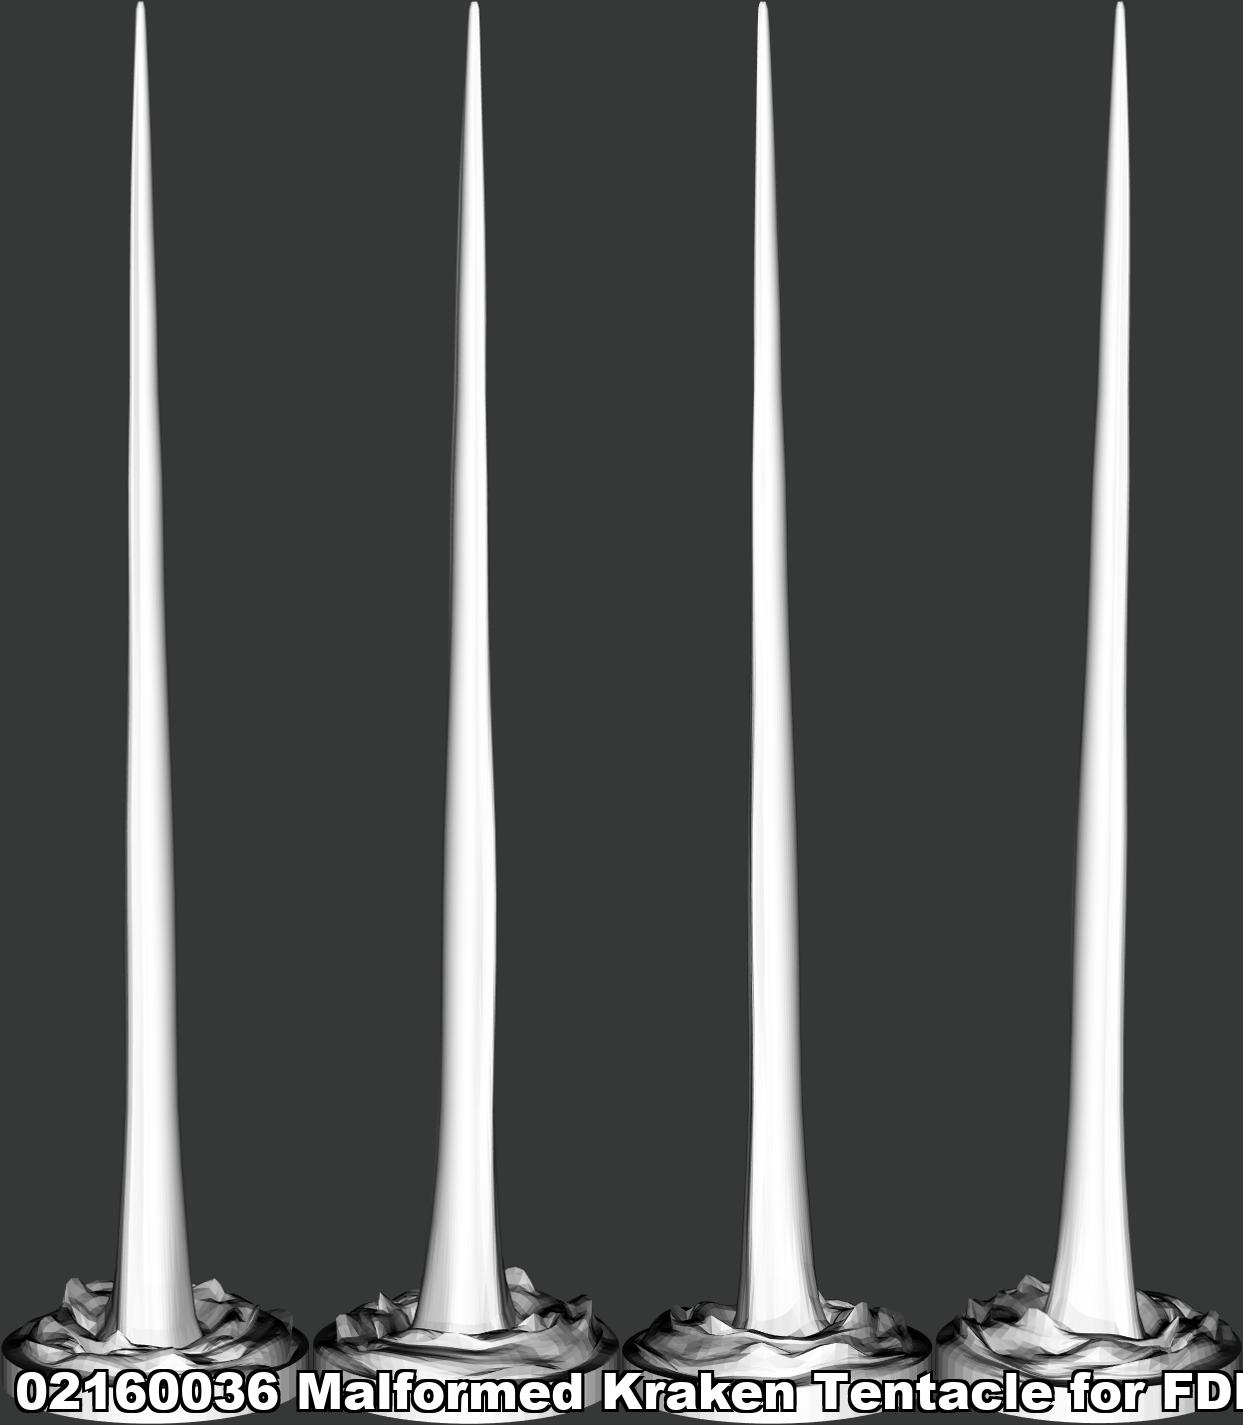 02160036 Malformed Kraken Tentacle for F